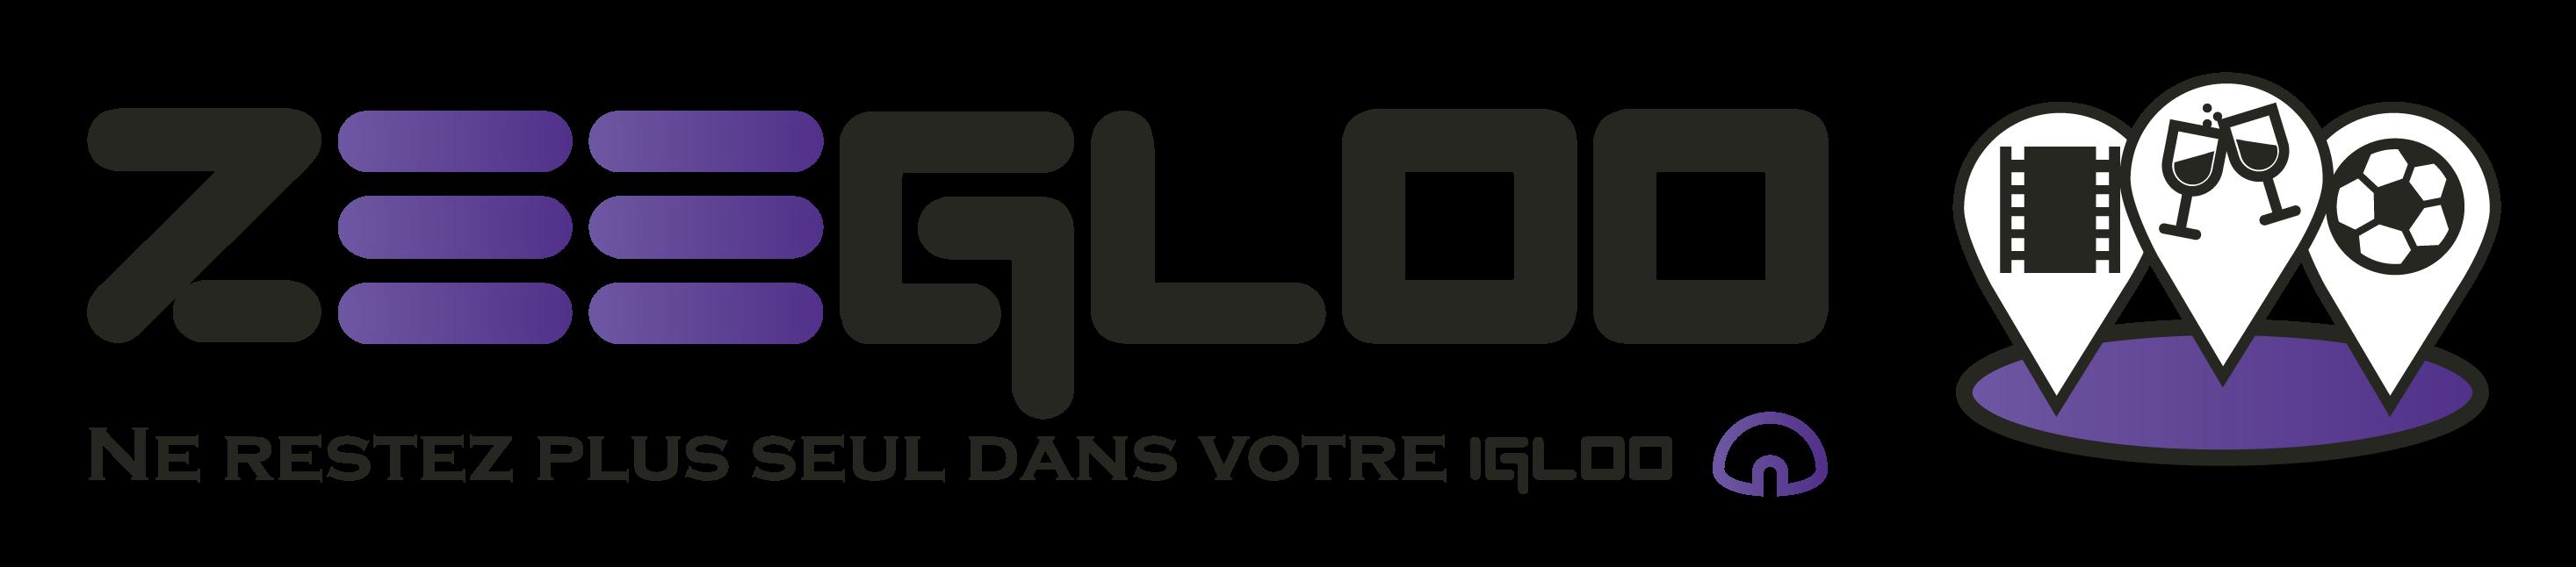 Logo de la startup ZEEGLOO